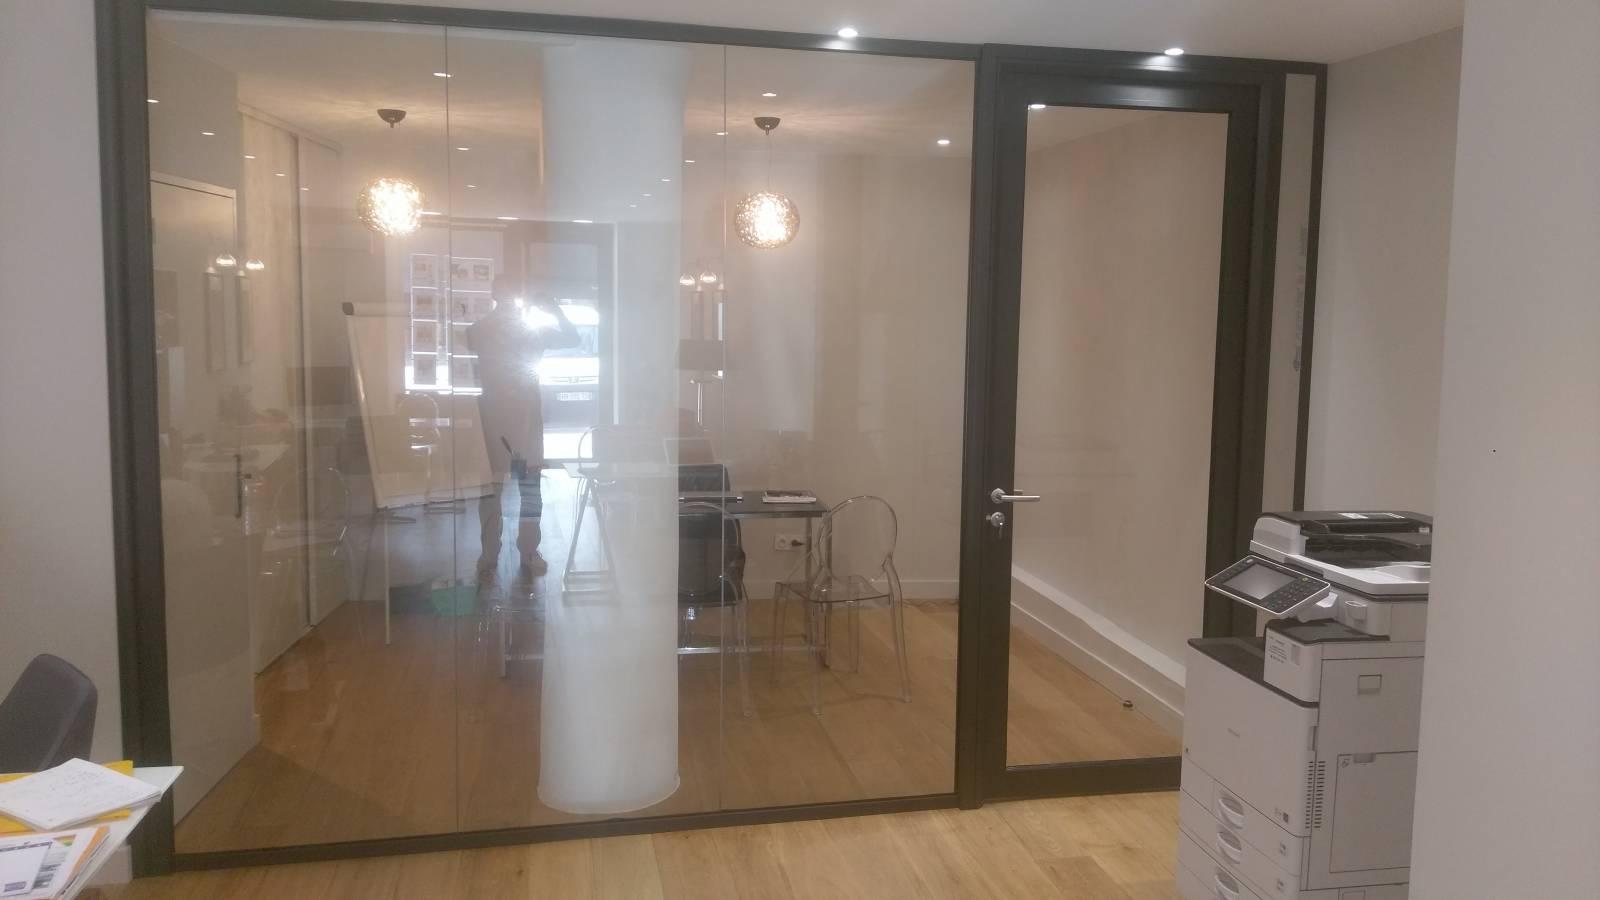 pose de cloisons vitr es aix en provence aix en provence nation cloison. Black Bedroom Furniture Sets. Home Design Ideas